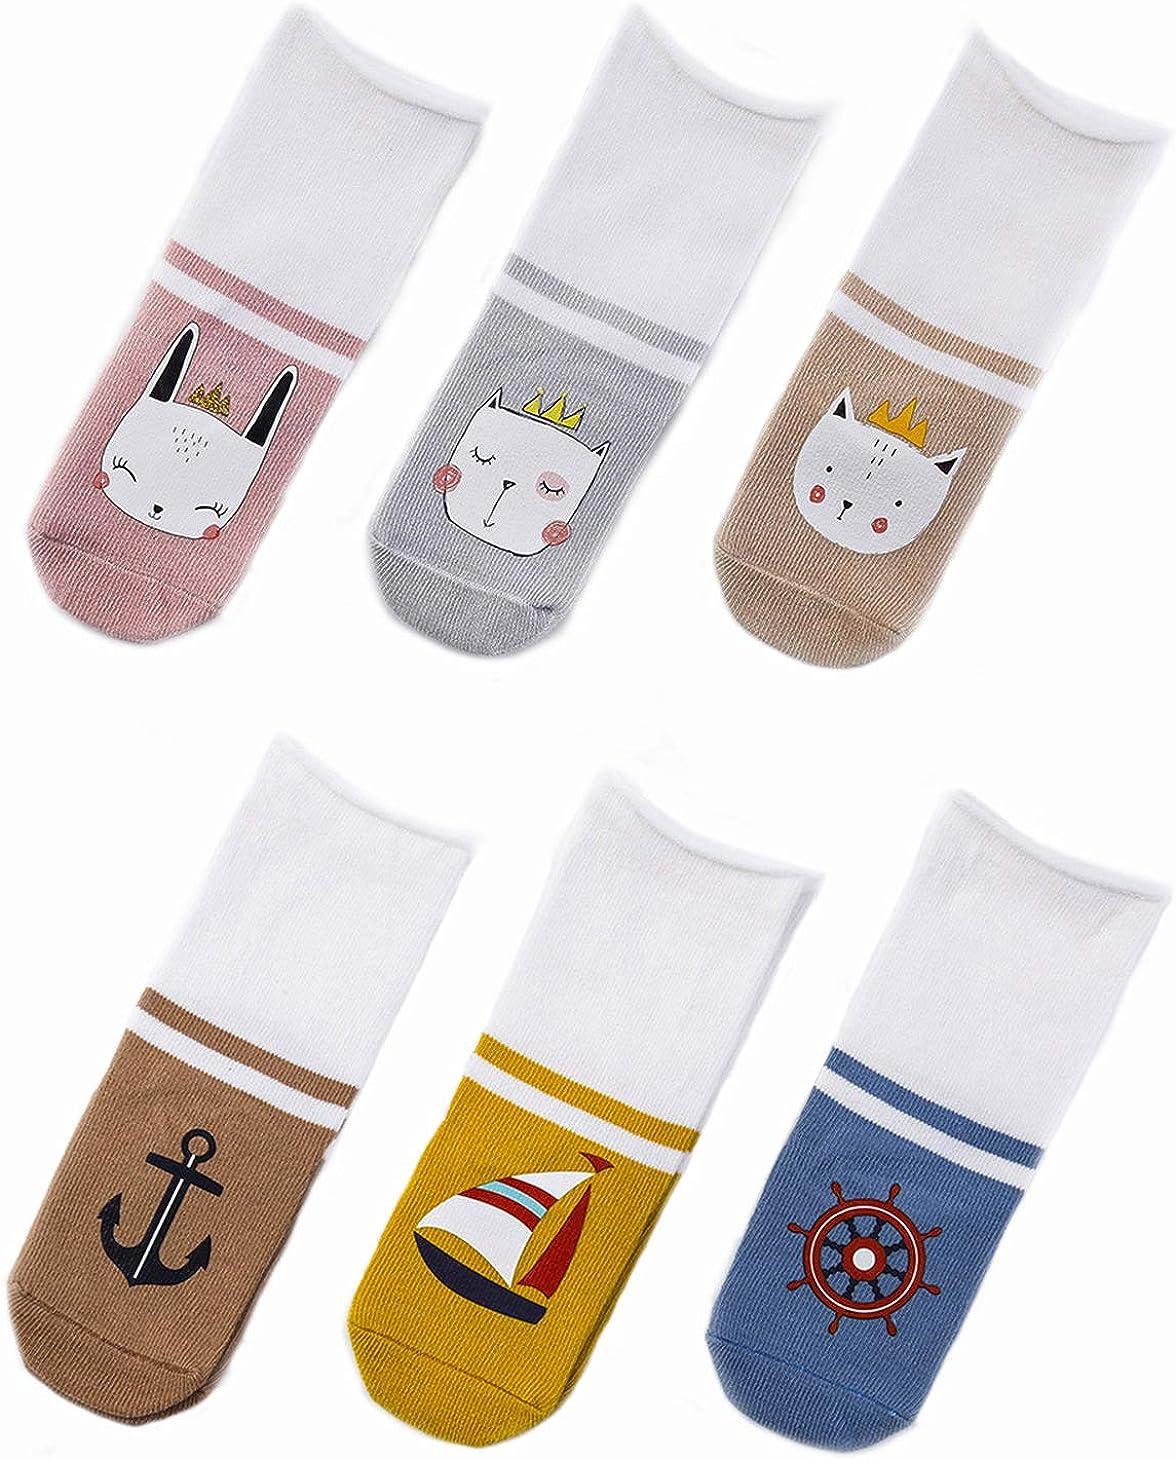 6-Pack Unisex Socks Baby Knee High Stockings Newborn Knee High Socks